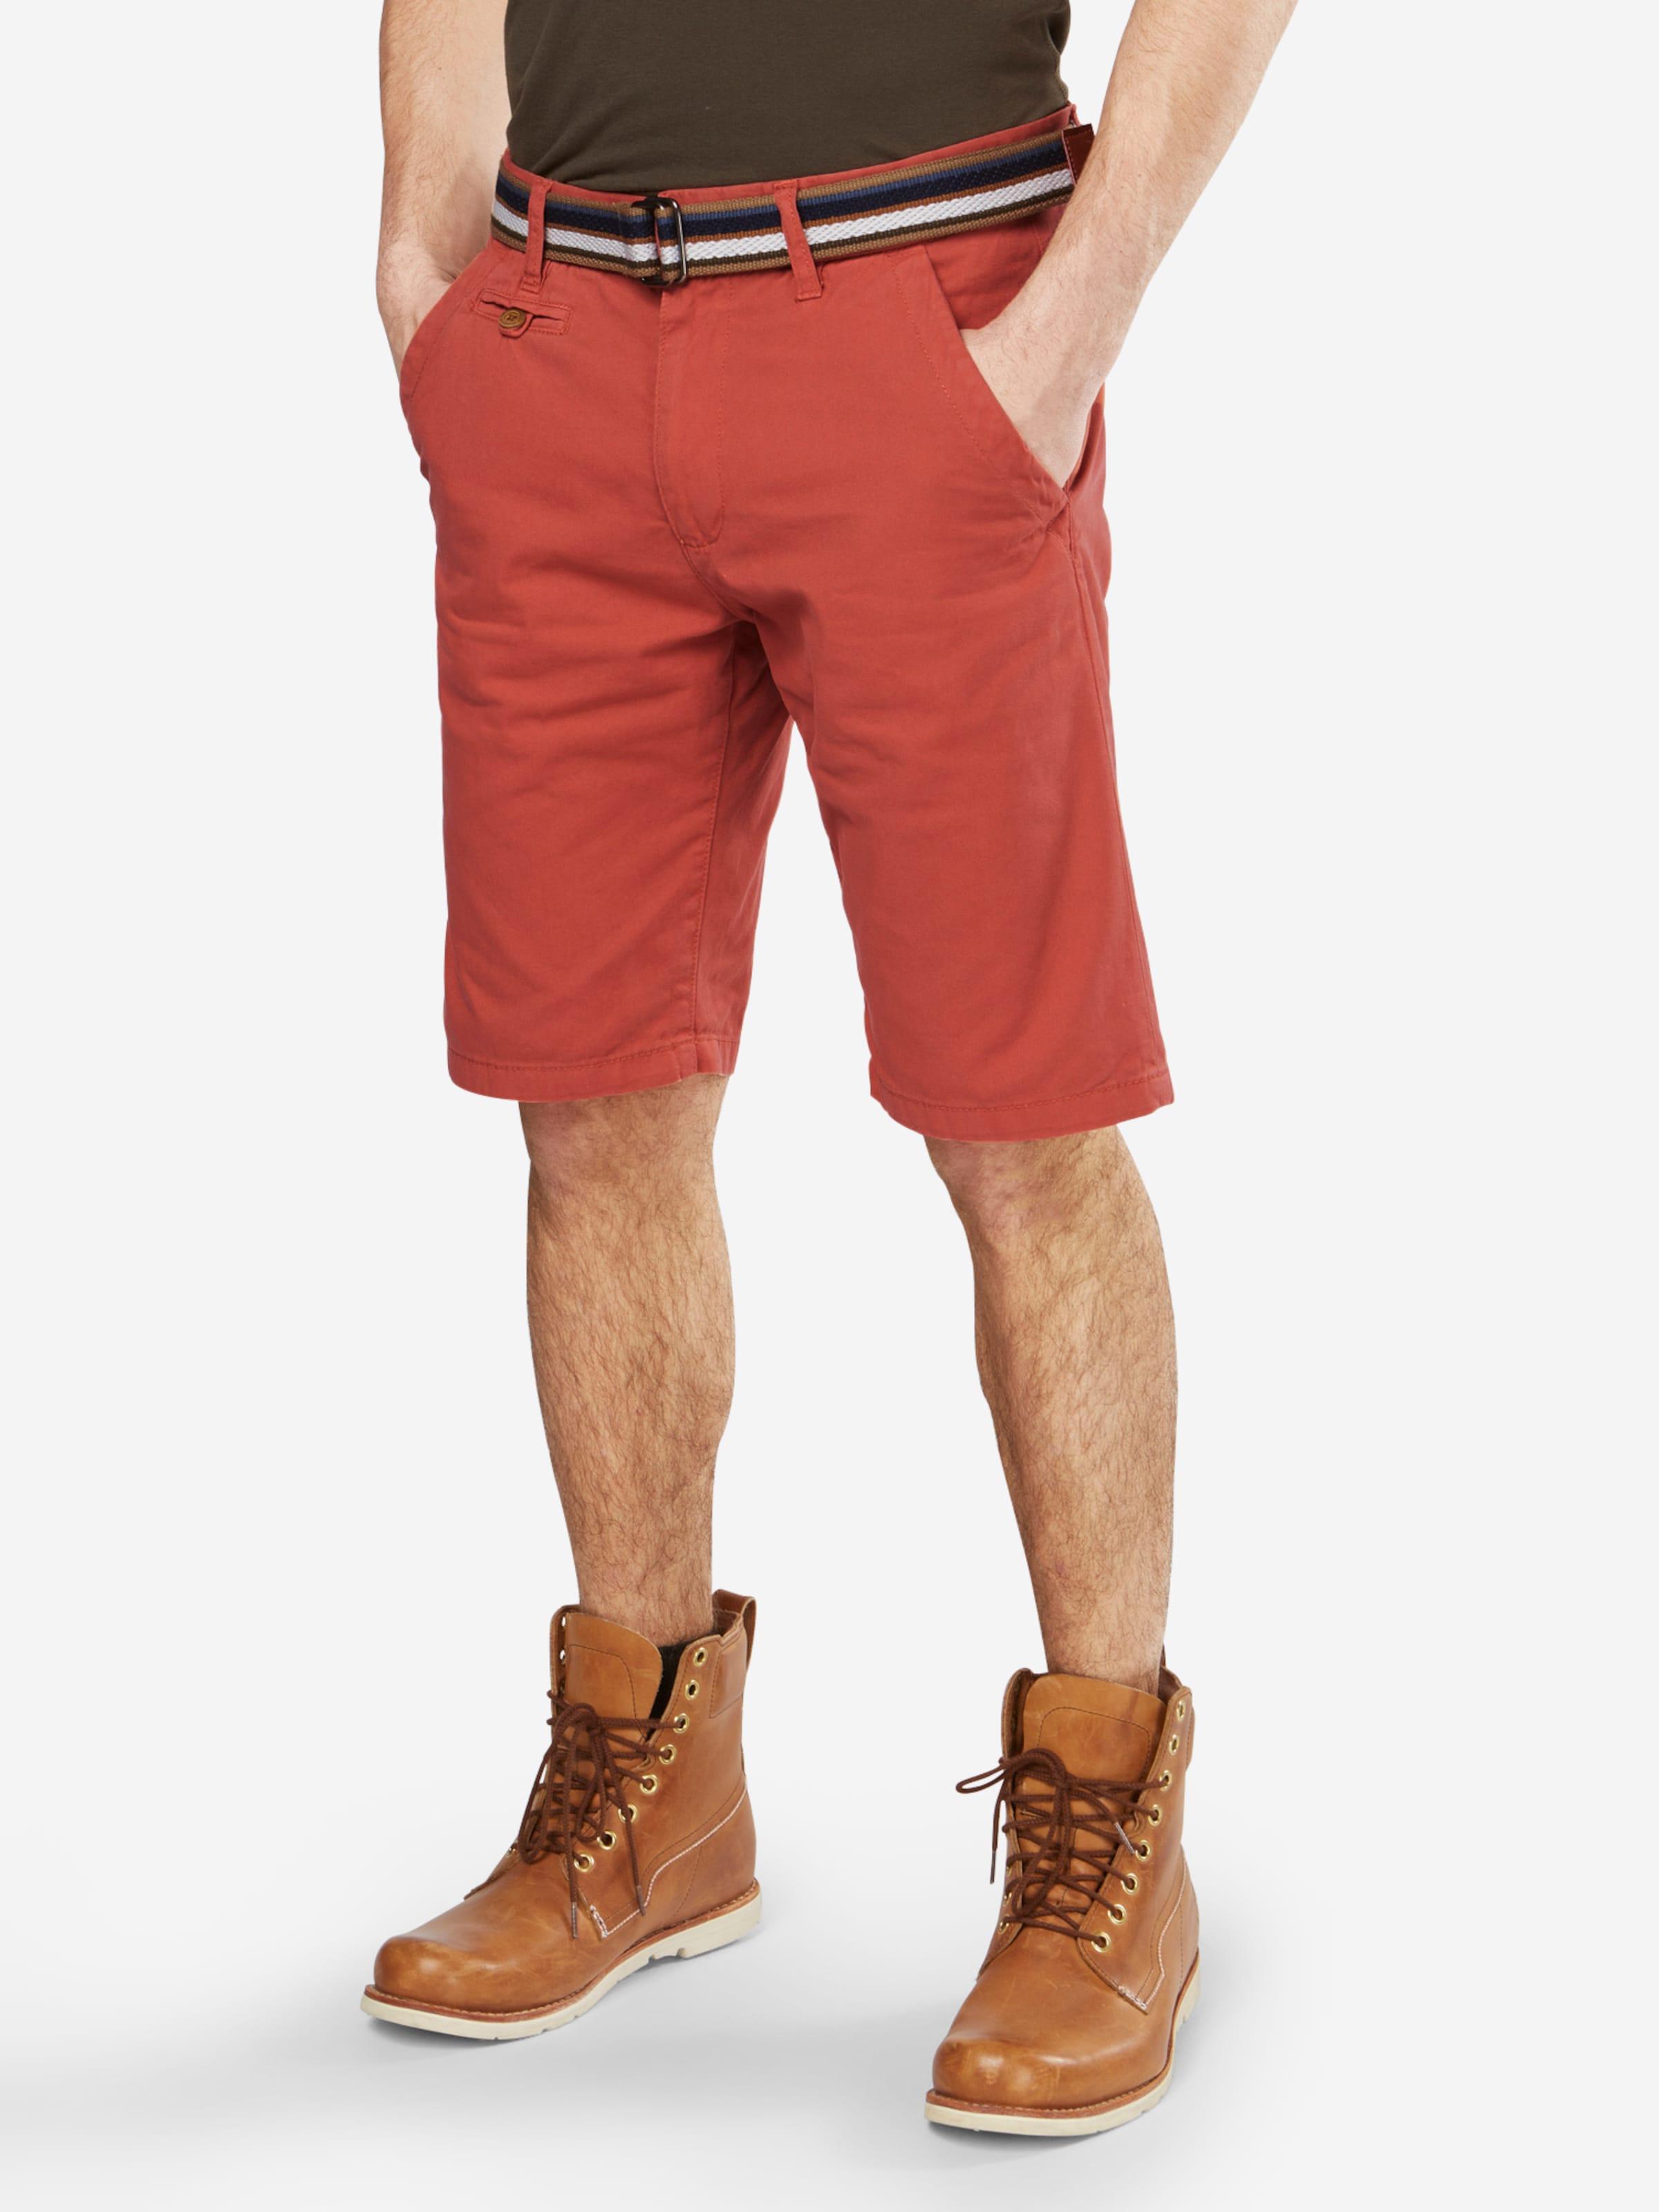 Orangerot Chino Indicode shorts In Jeans 'royce' EI2bD9YWeH